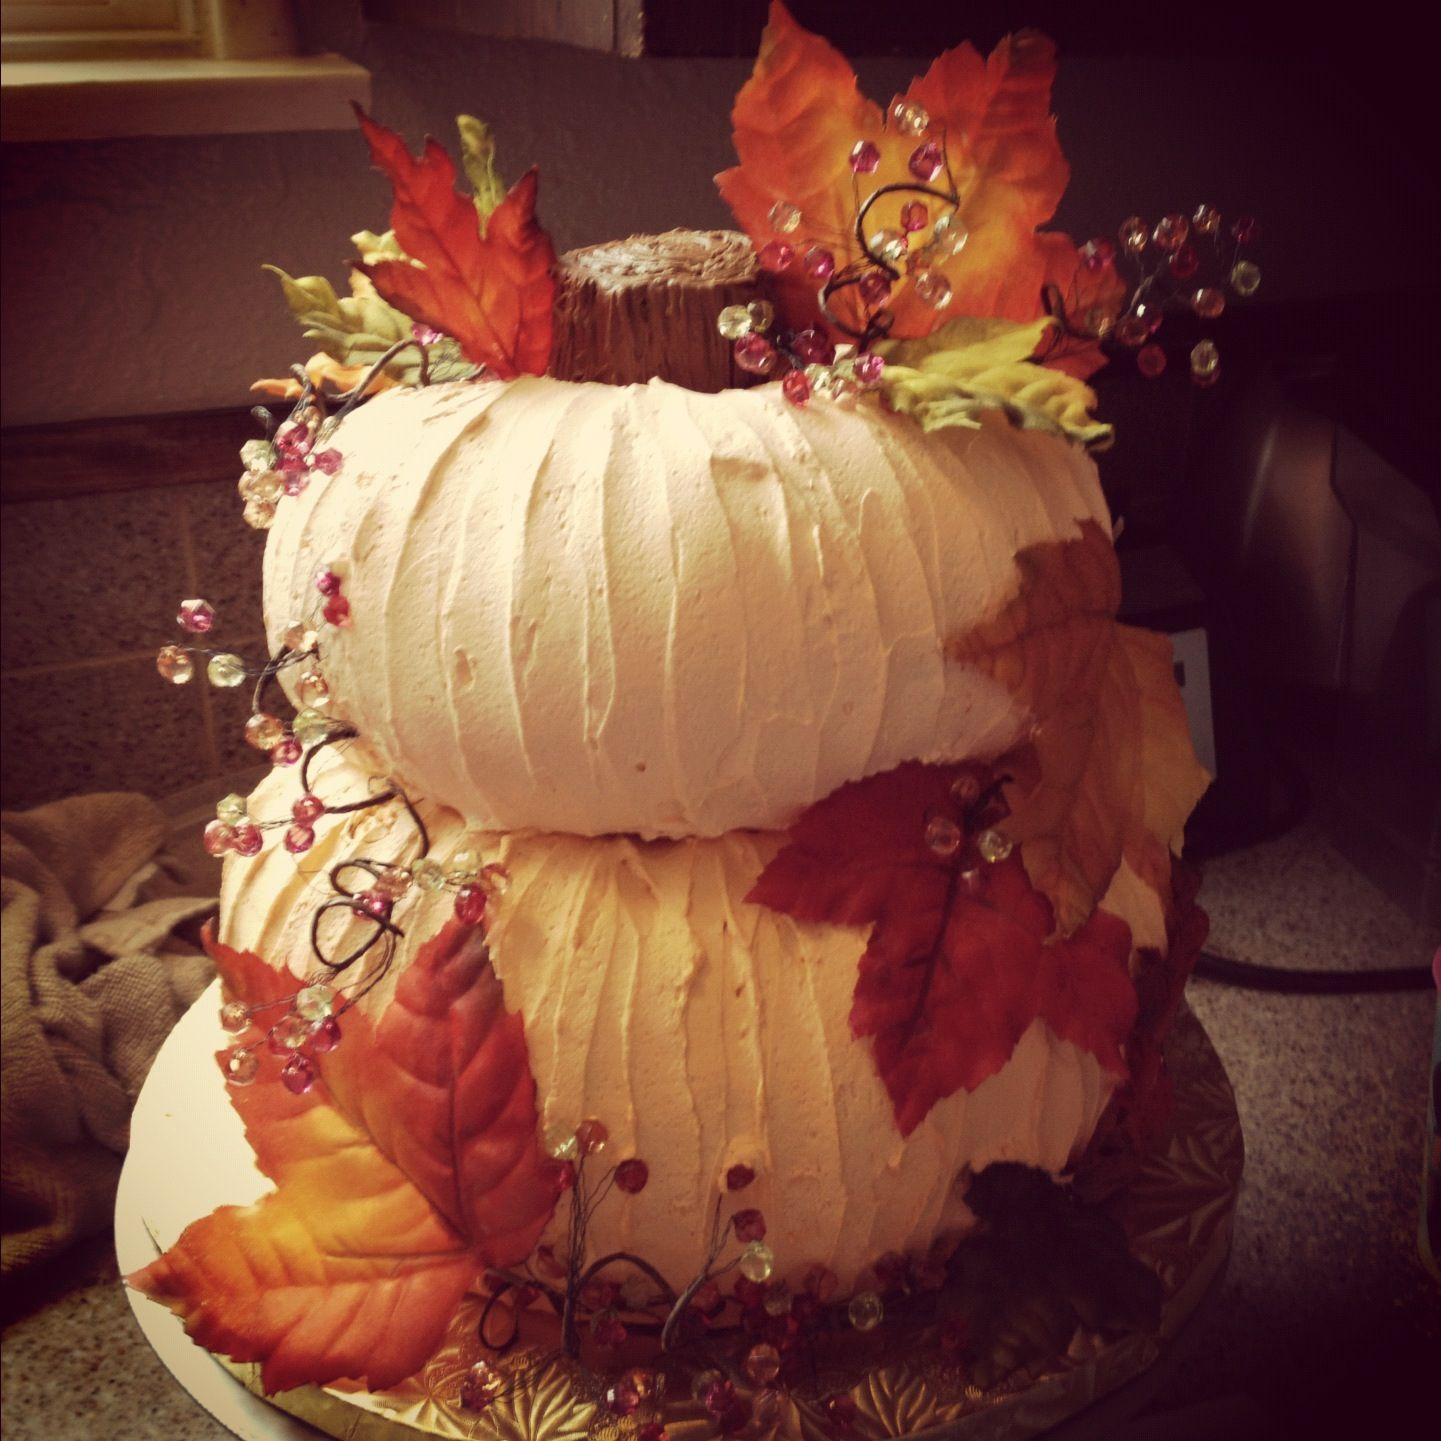 Fall Wedding Cakes Ideas: Fall Themed Pumpkin Bridal Shower Cake.